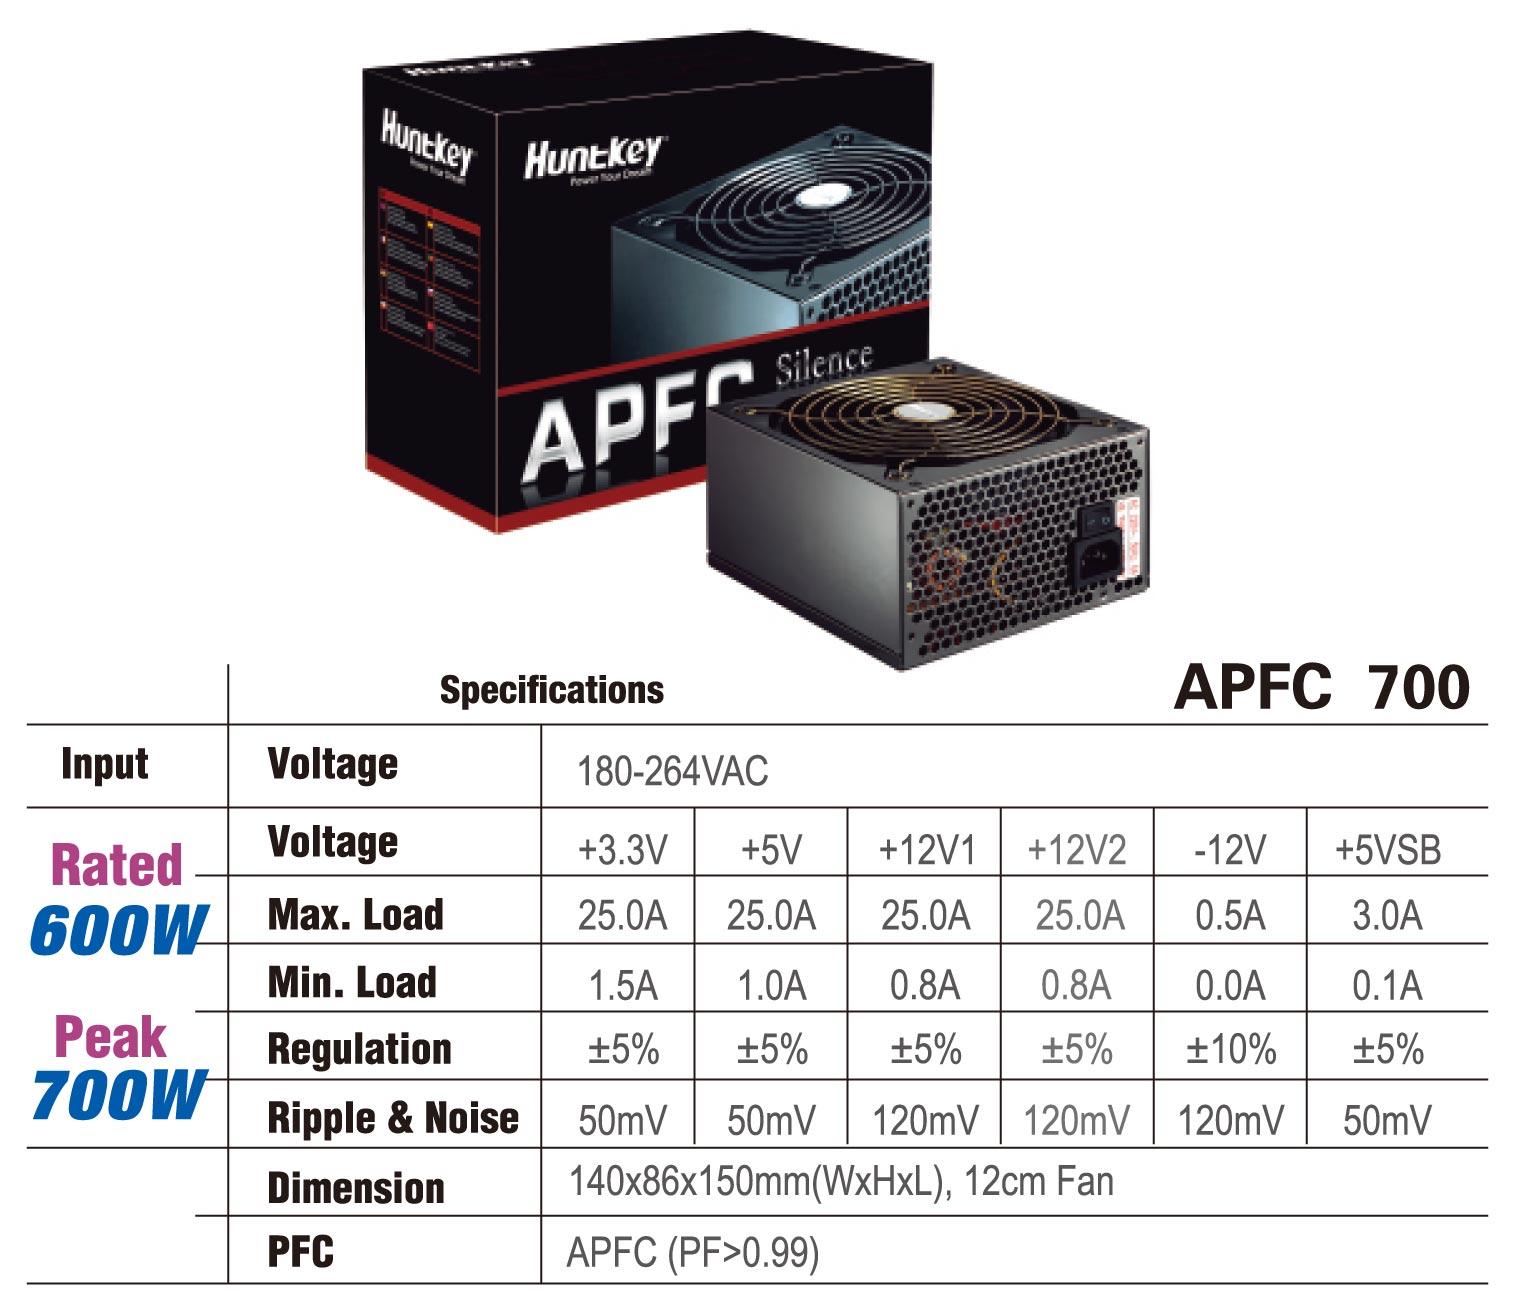 11-42 APFC 700